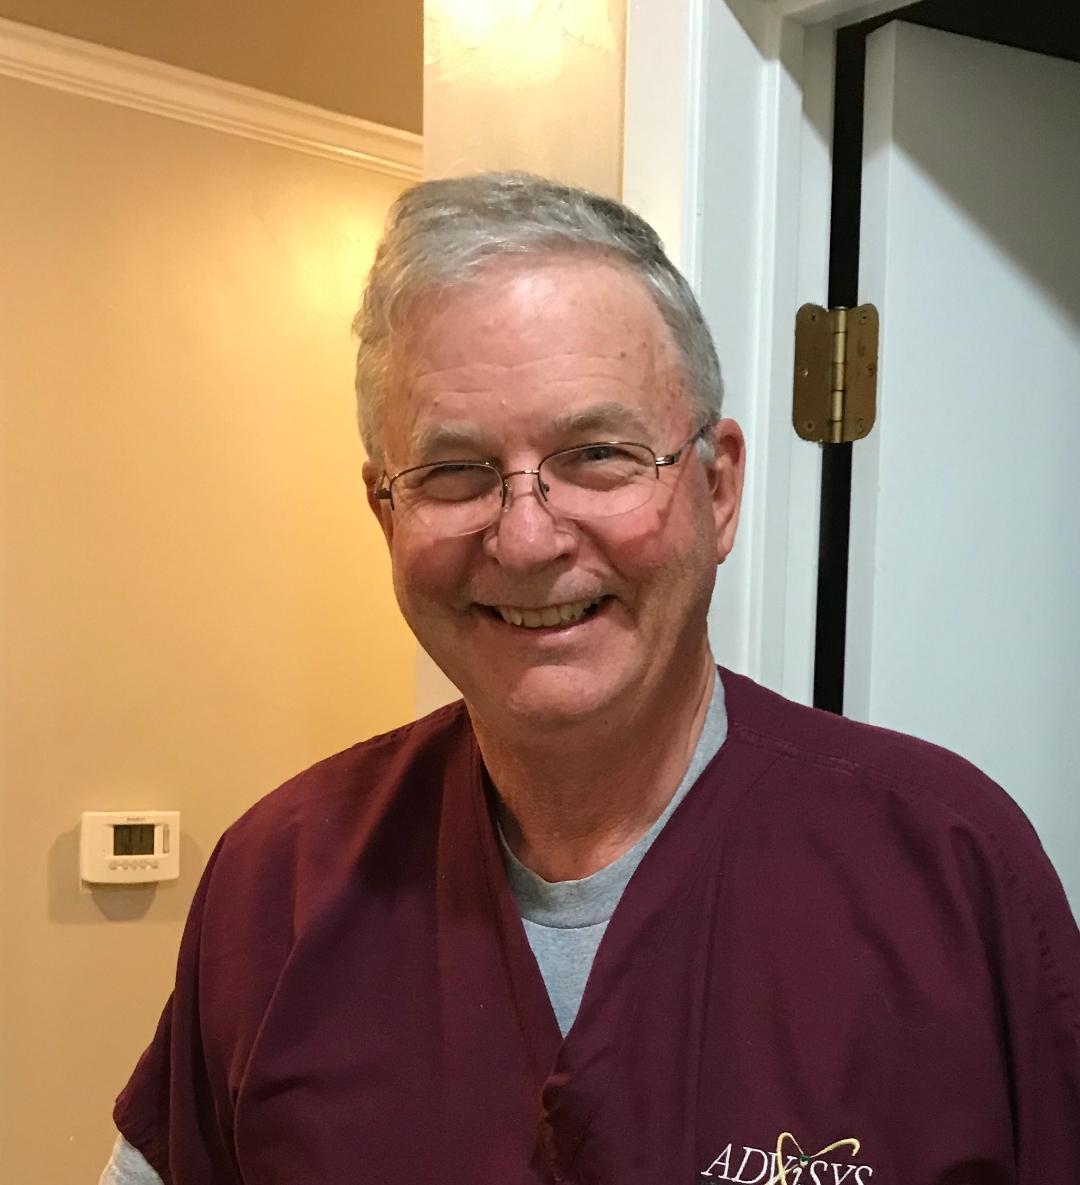 Dr. Carpenter